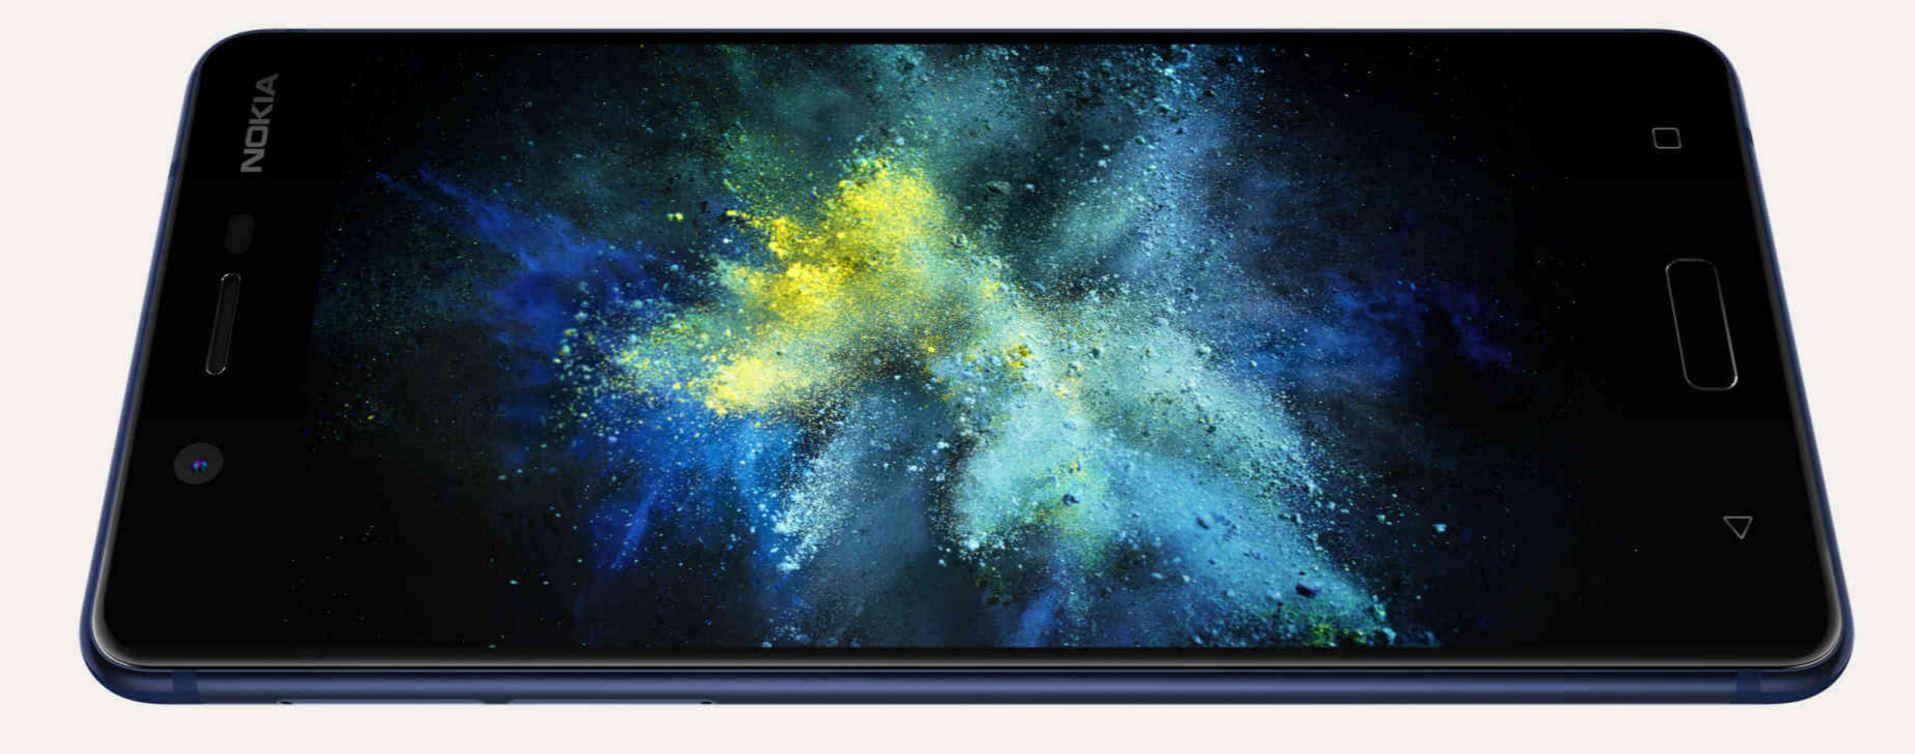 nokia smartphone mwc 2017 nokia 5